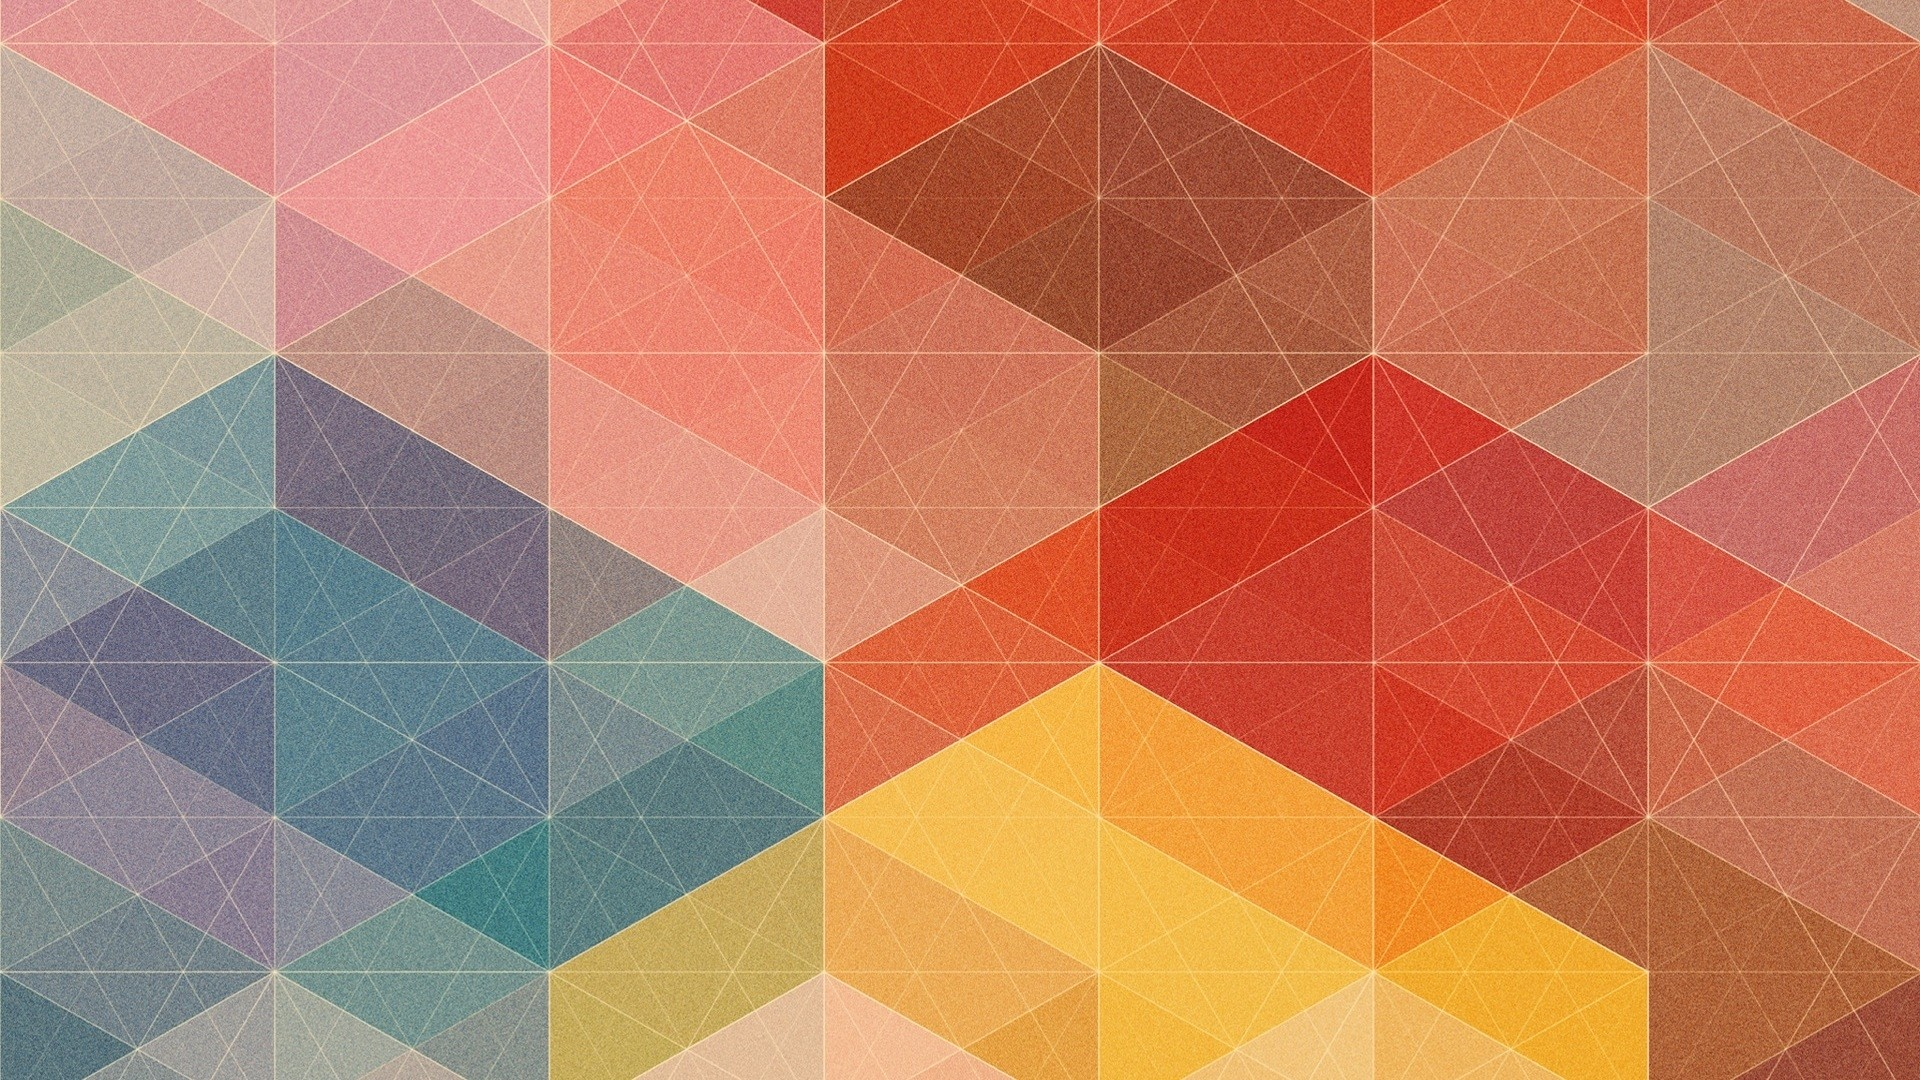 Geometric computer wallpaper